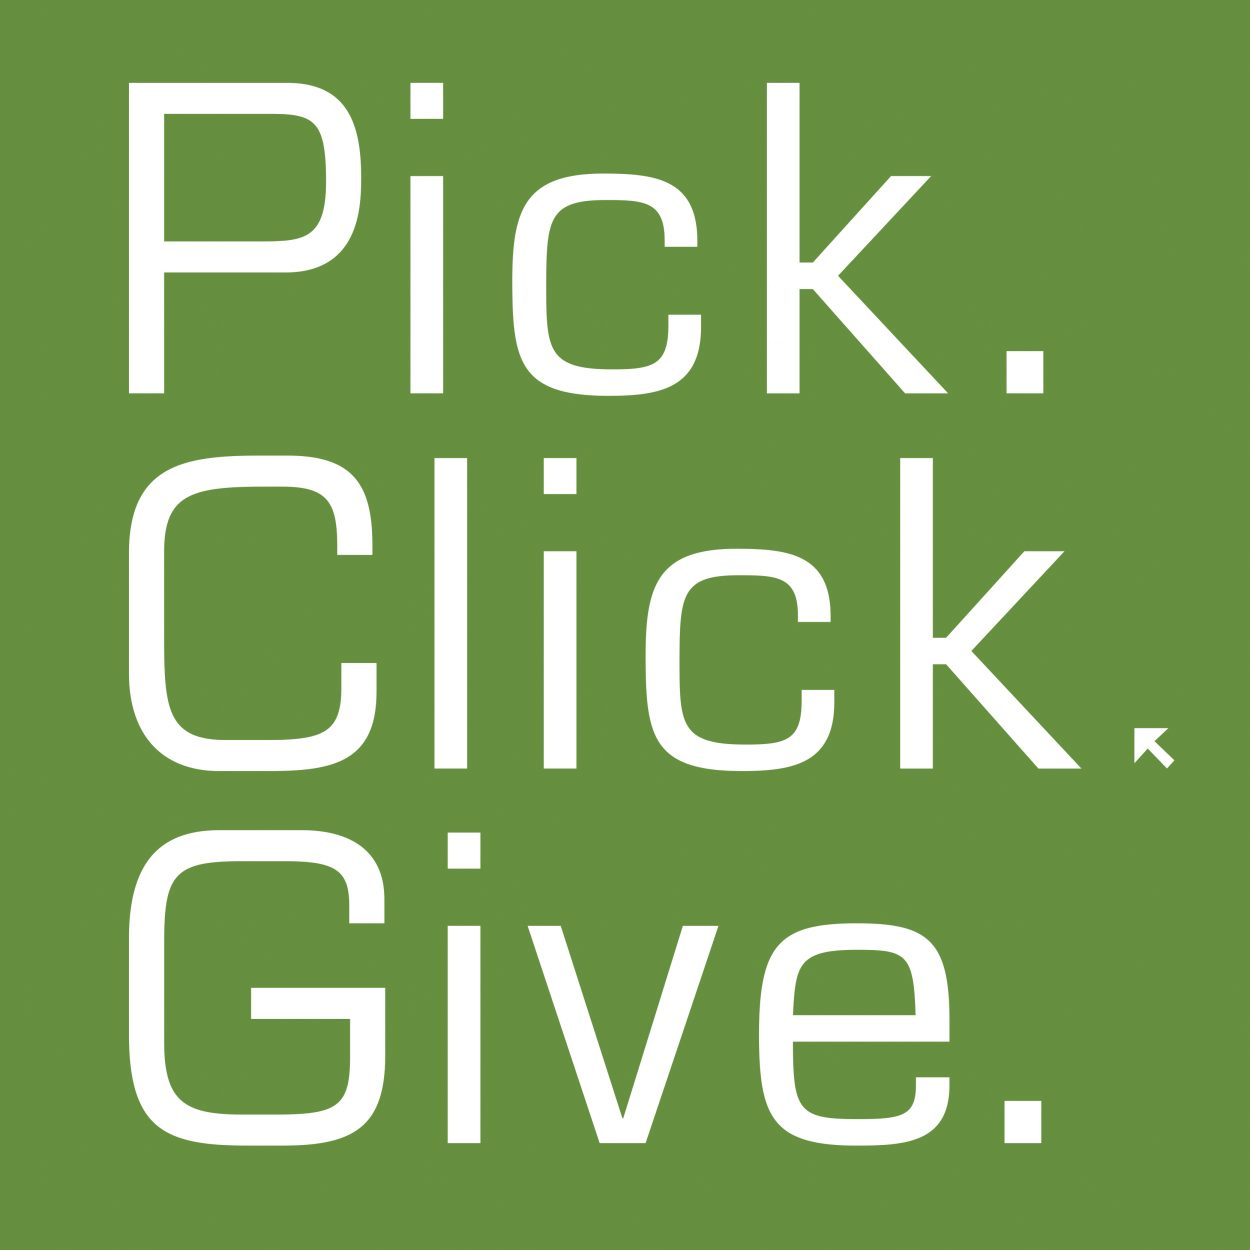 Pick. Click. Give.